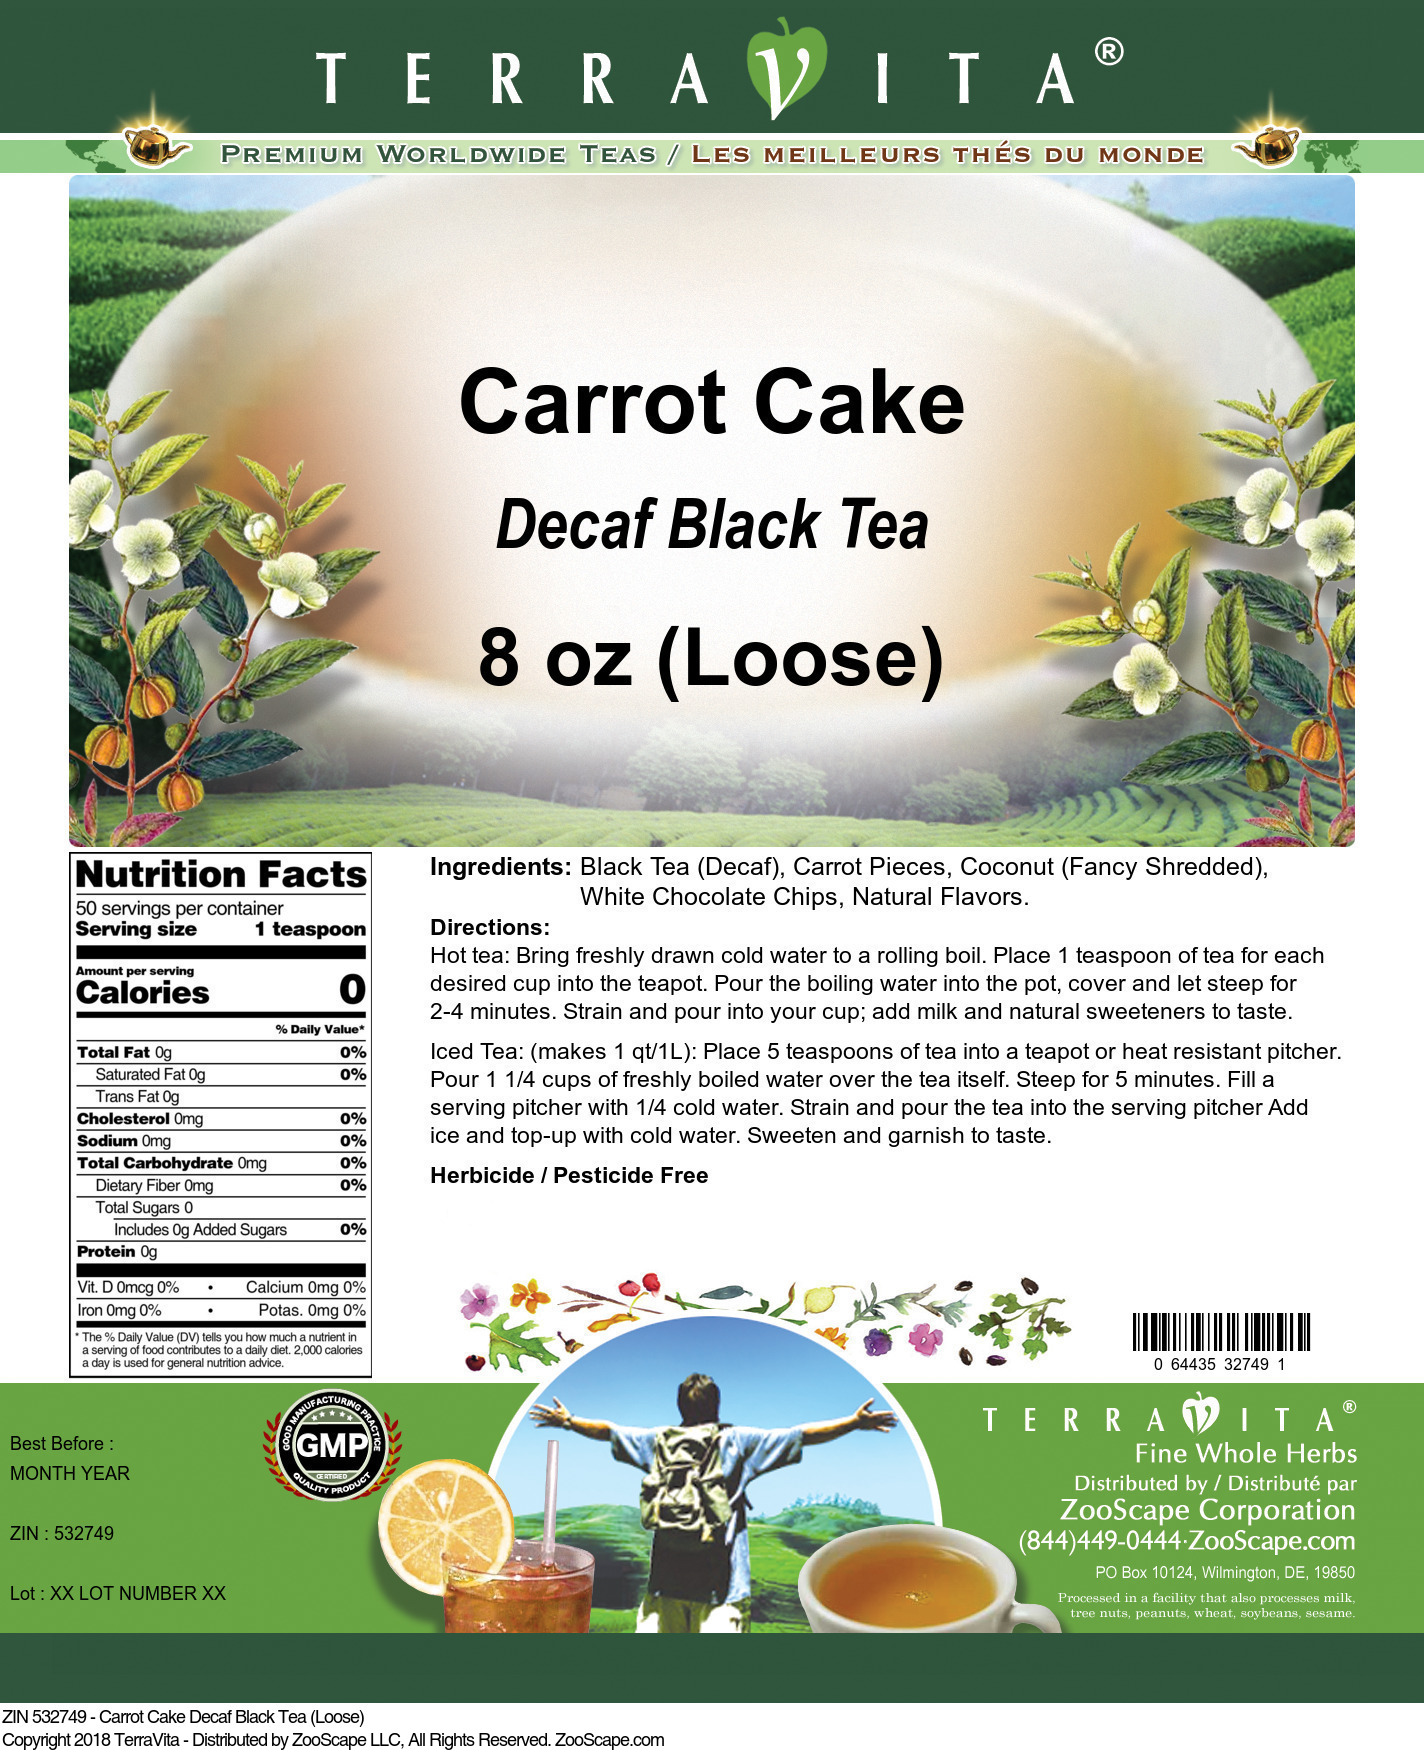 Carrot Cake Decaf Black Tea (Loose)